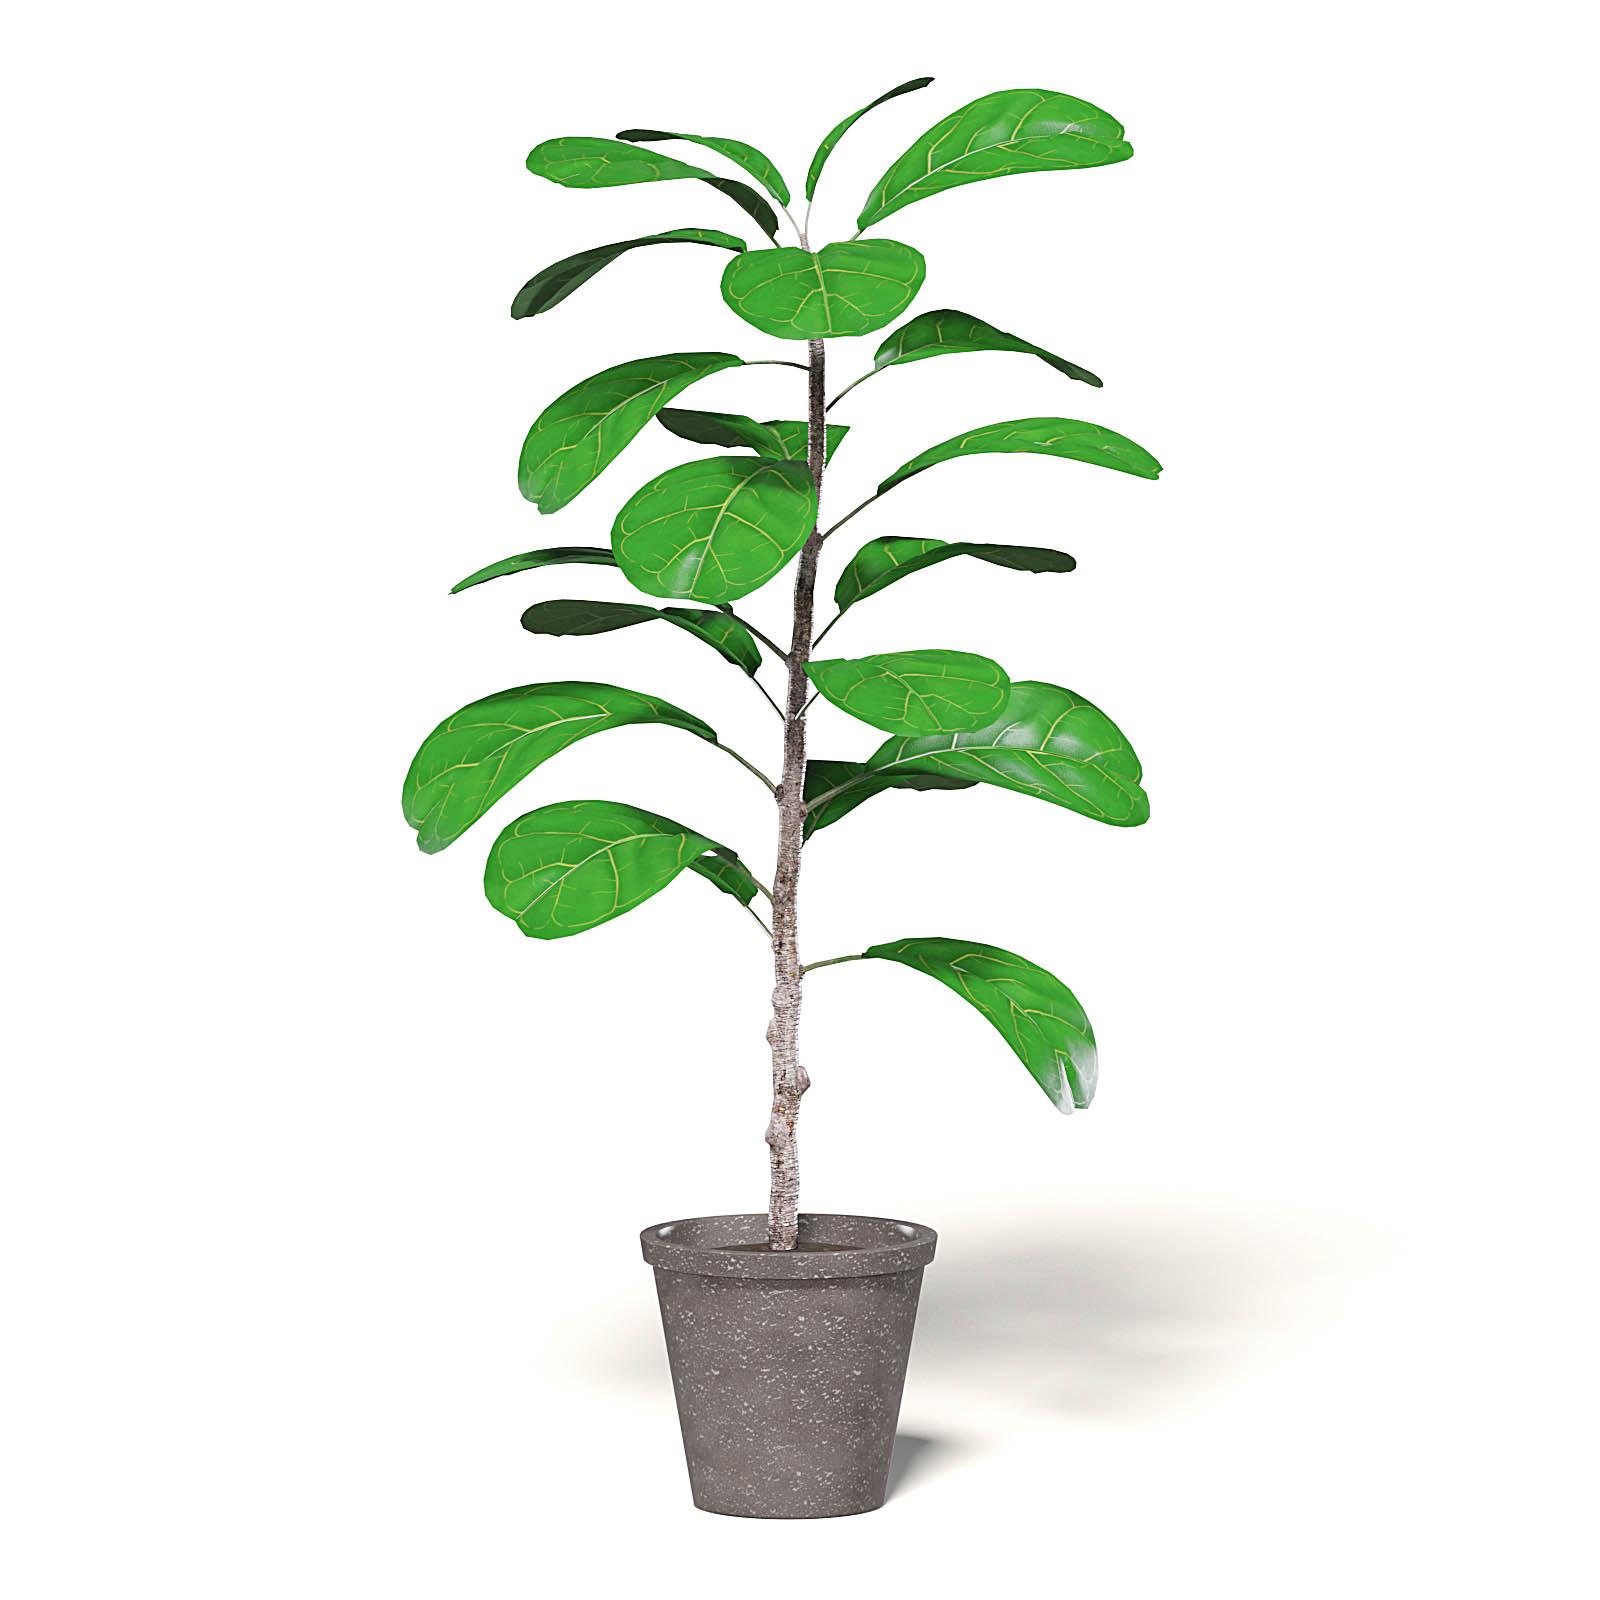 Fig Plant 3D Model in Brown Pot